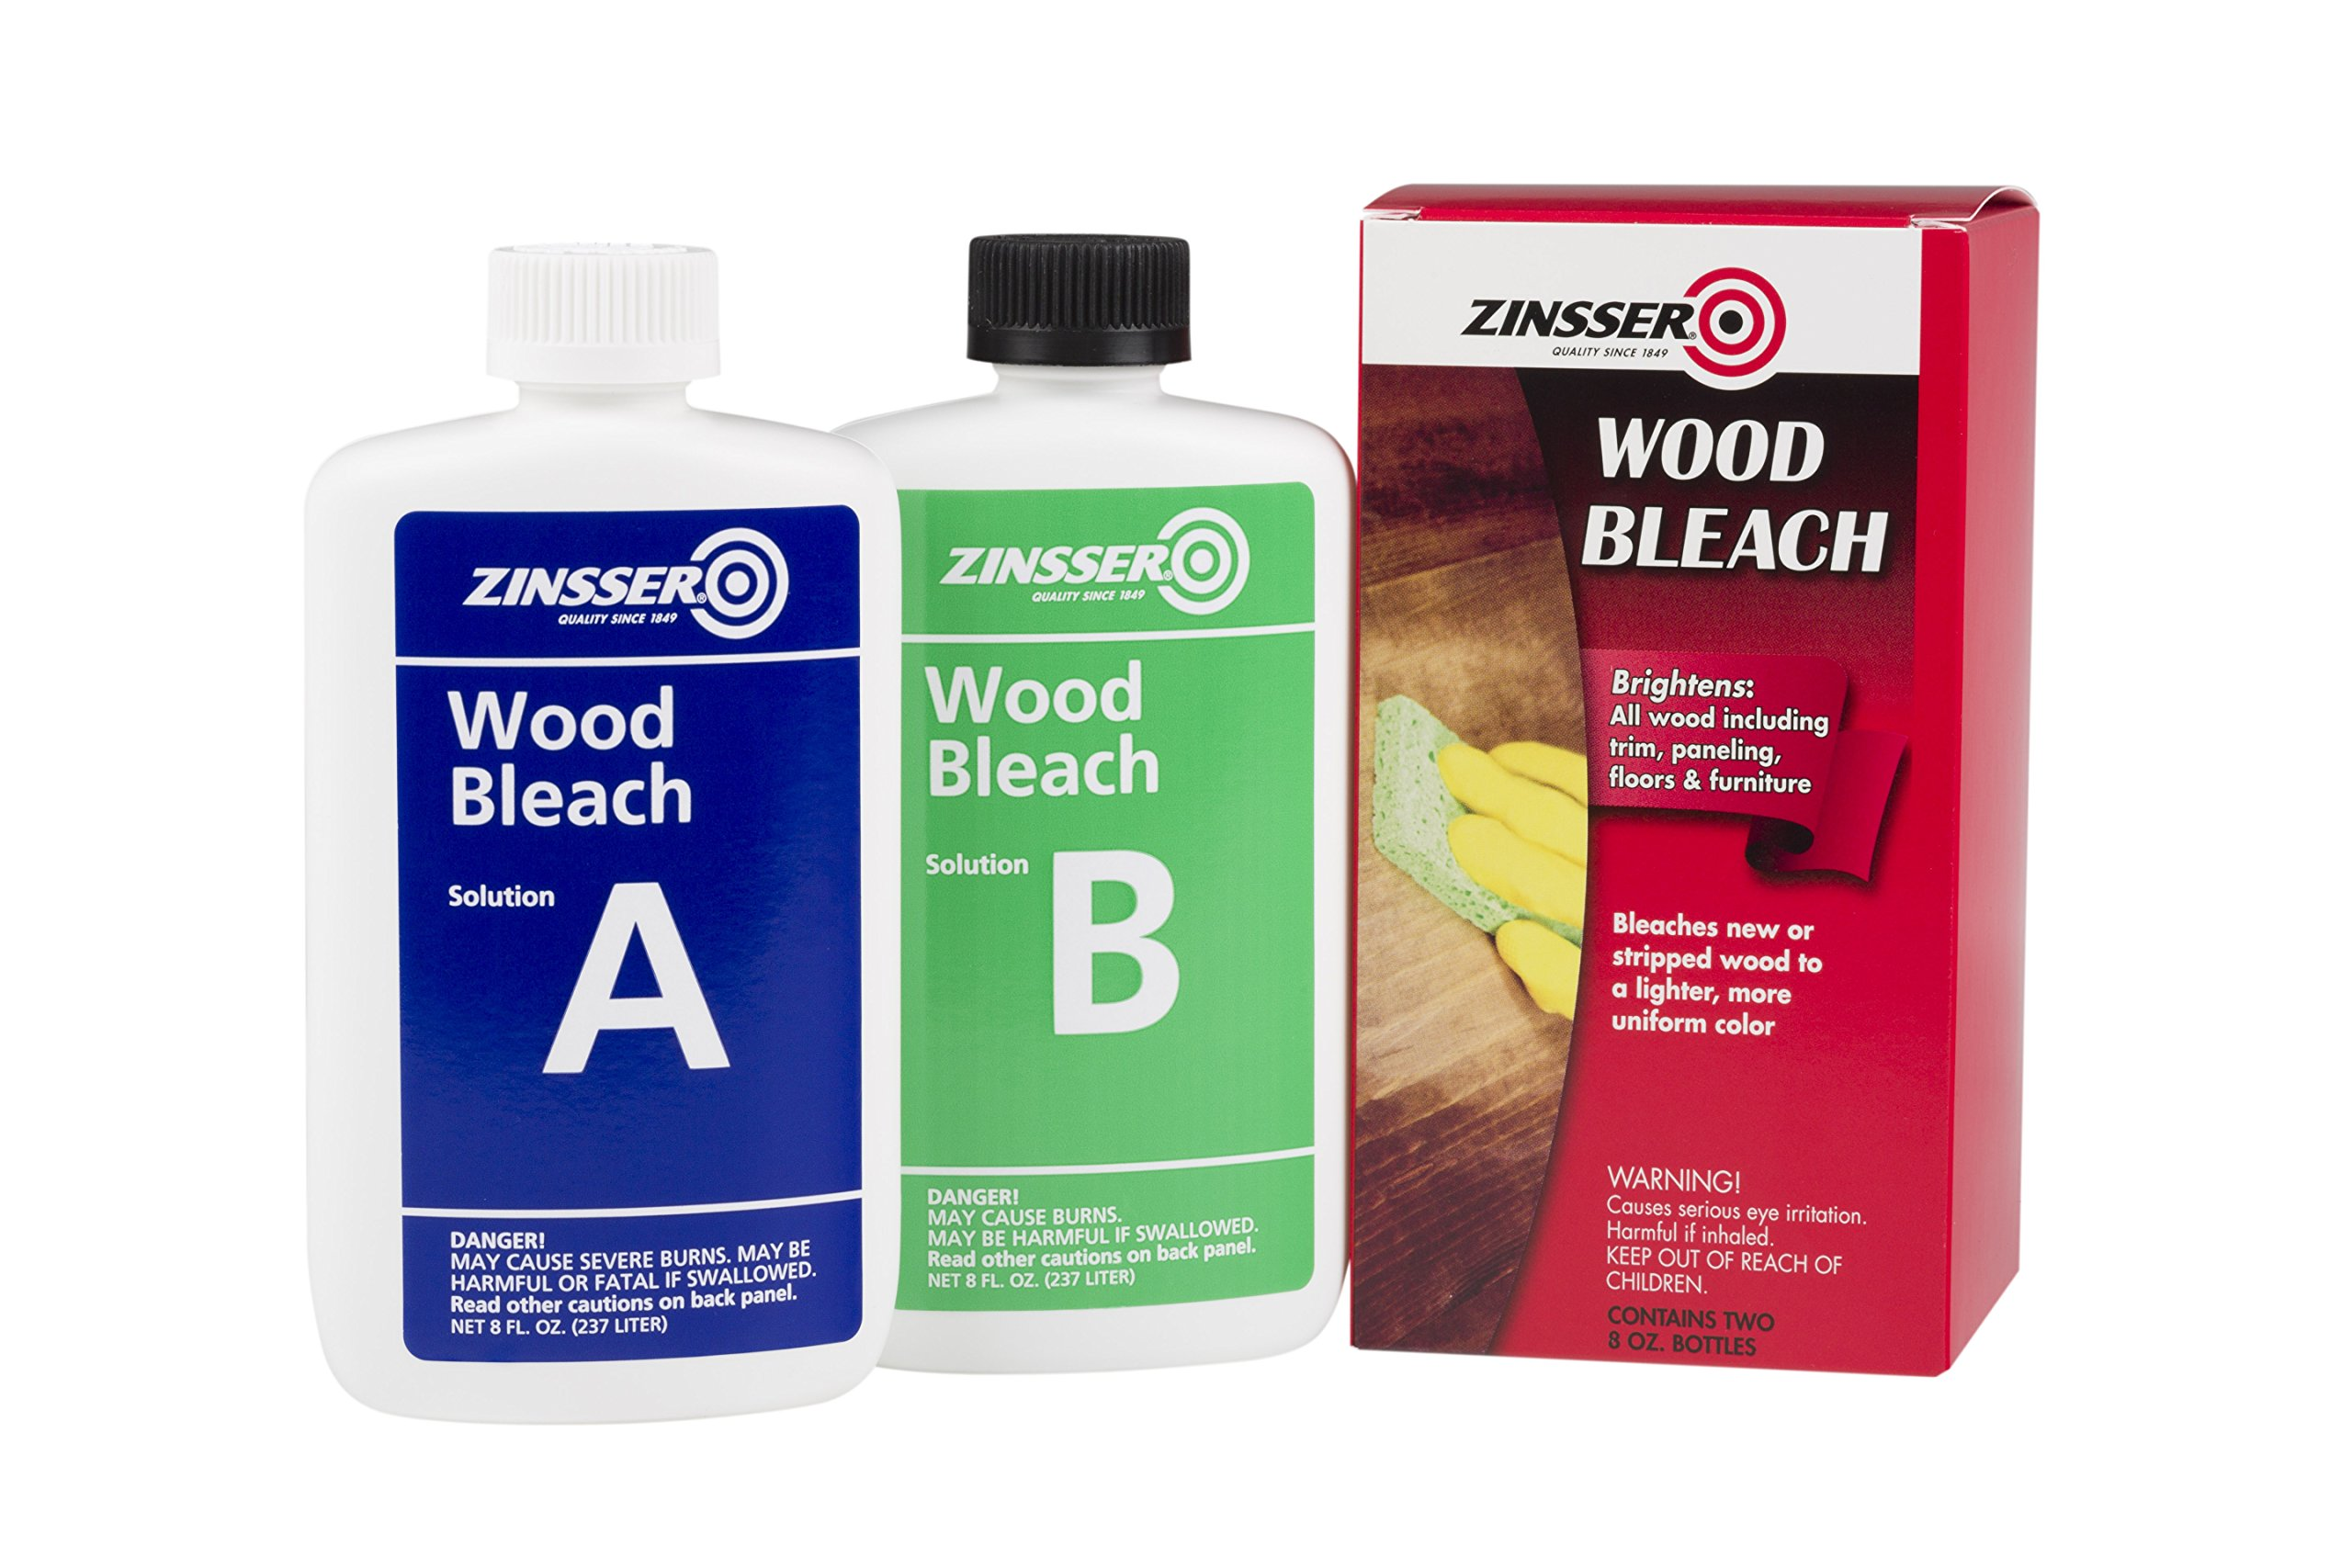 Zinsser 300451 Wood Bleach